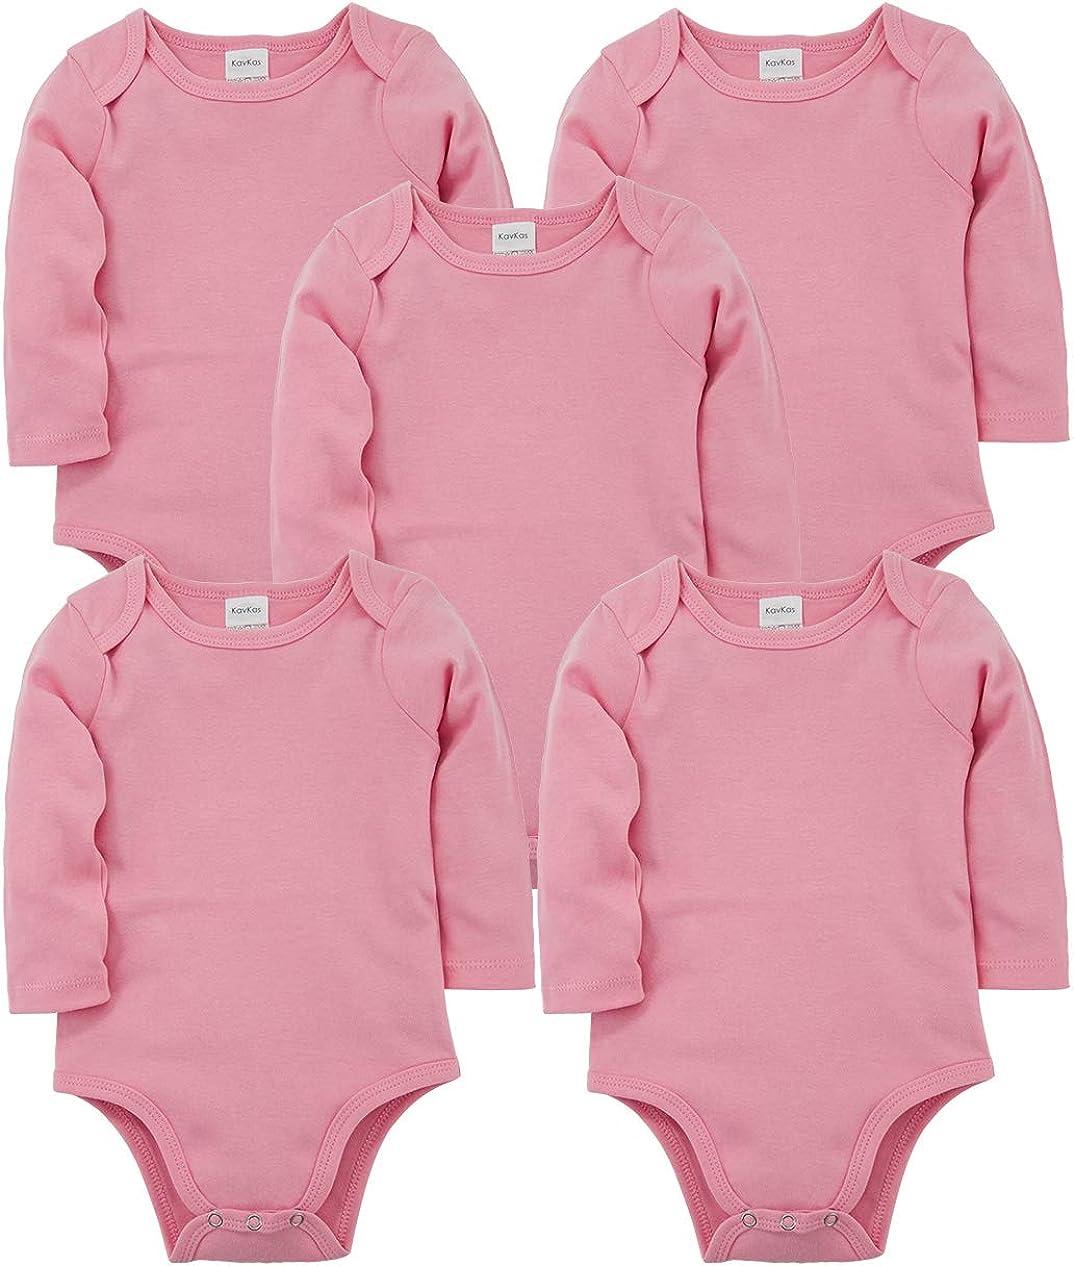 kavkas Baby Long Sleeve Onesies Infant Boys Girls Soft Cotton Bodysuit 5 Pack Newborn Undershirts